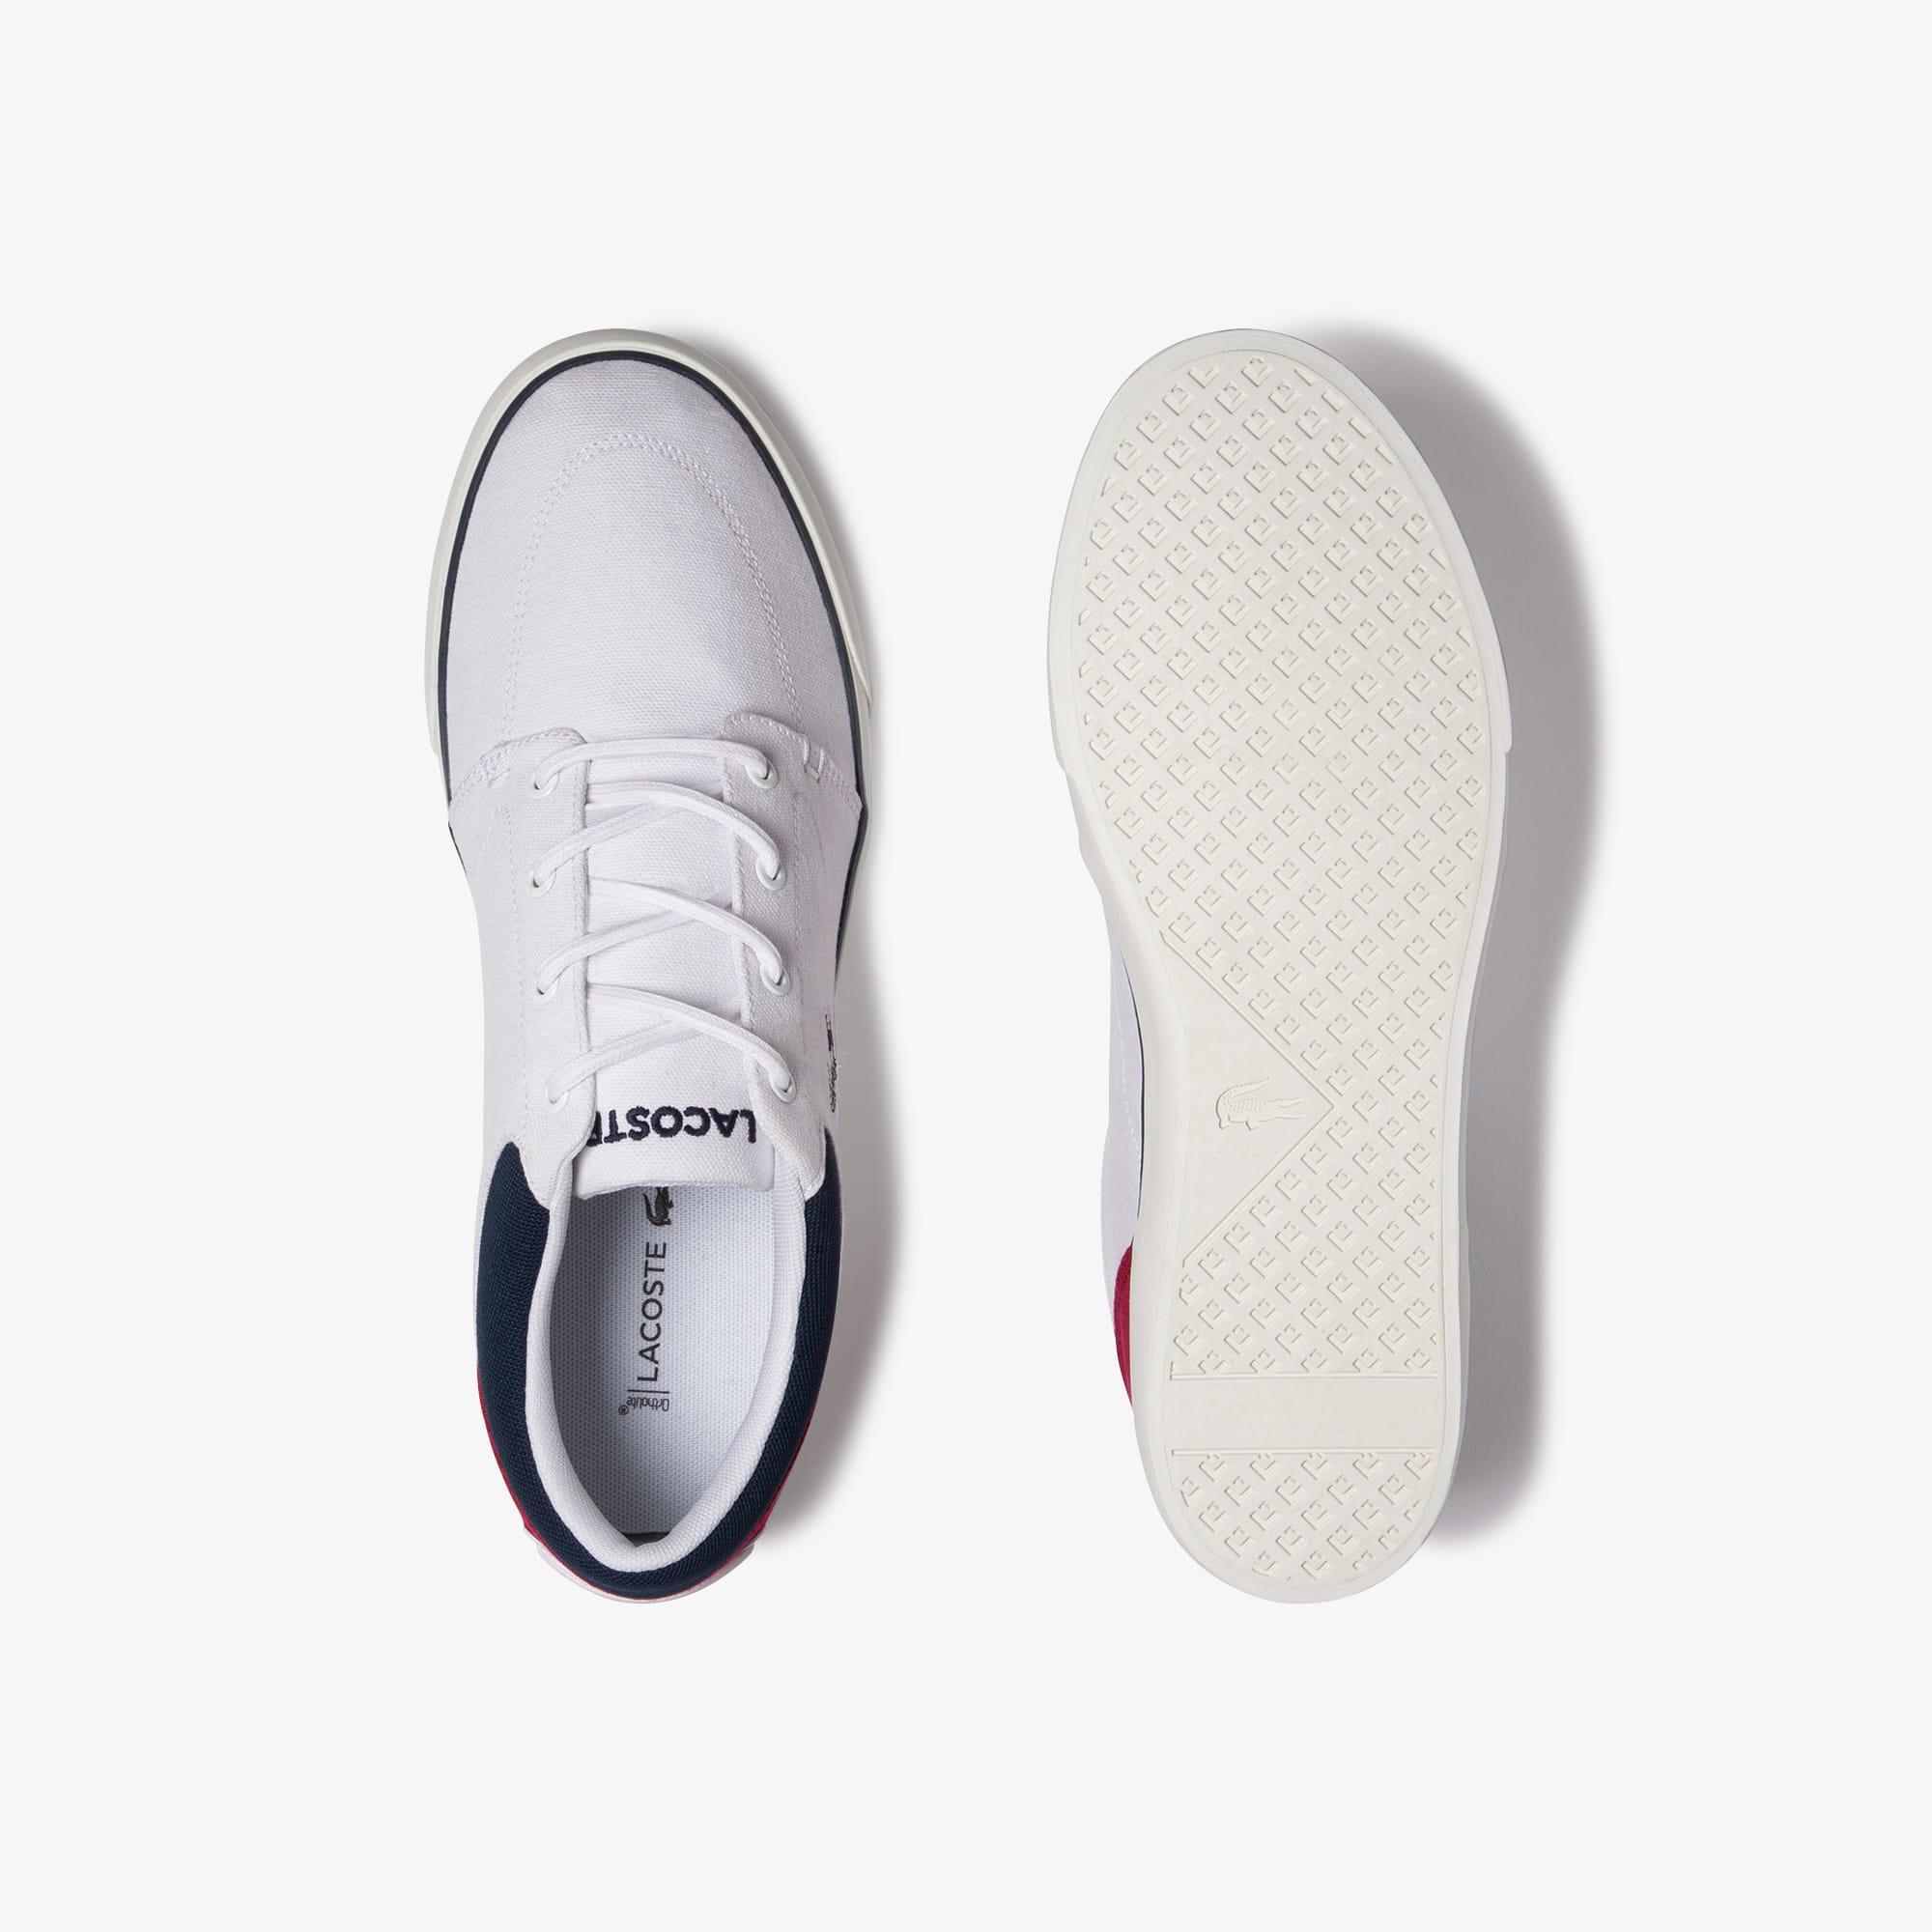 Men's Bayliss Canvas Sneakers | LACOSTE